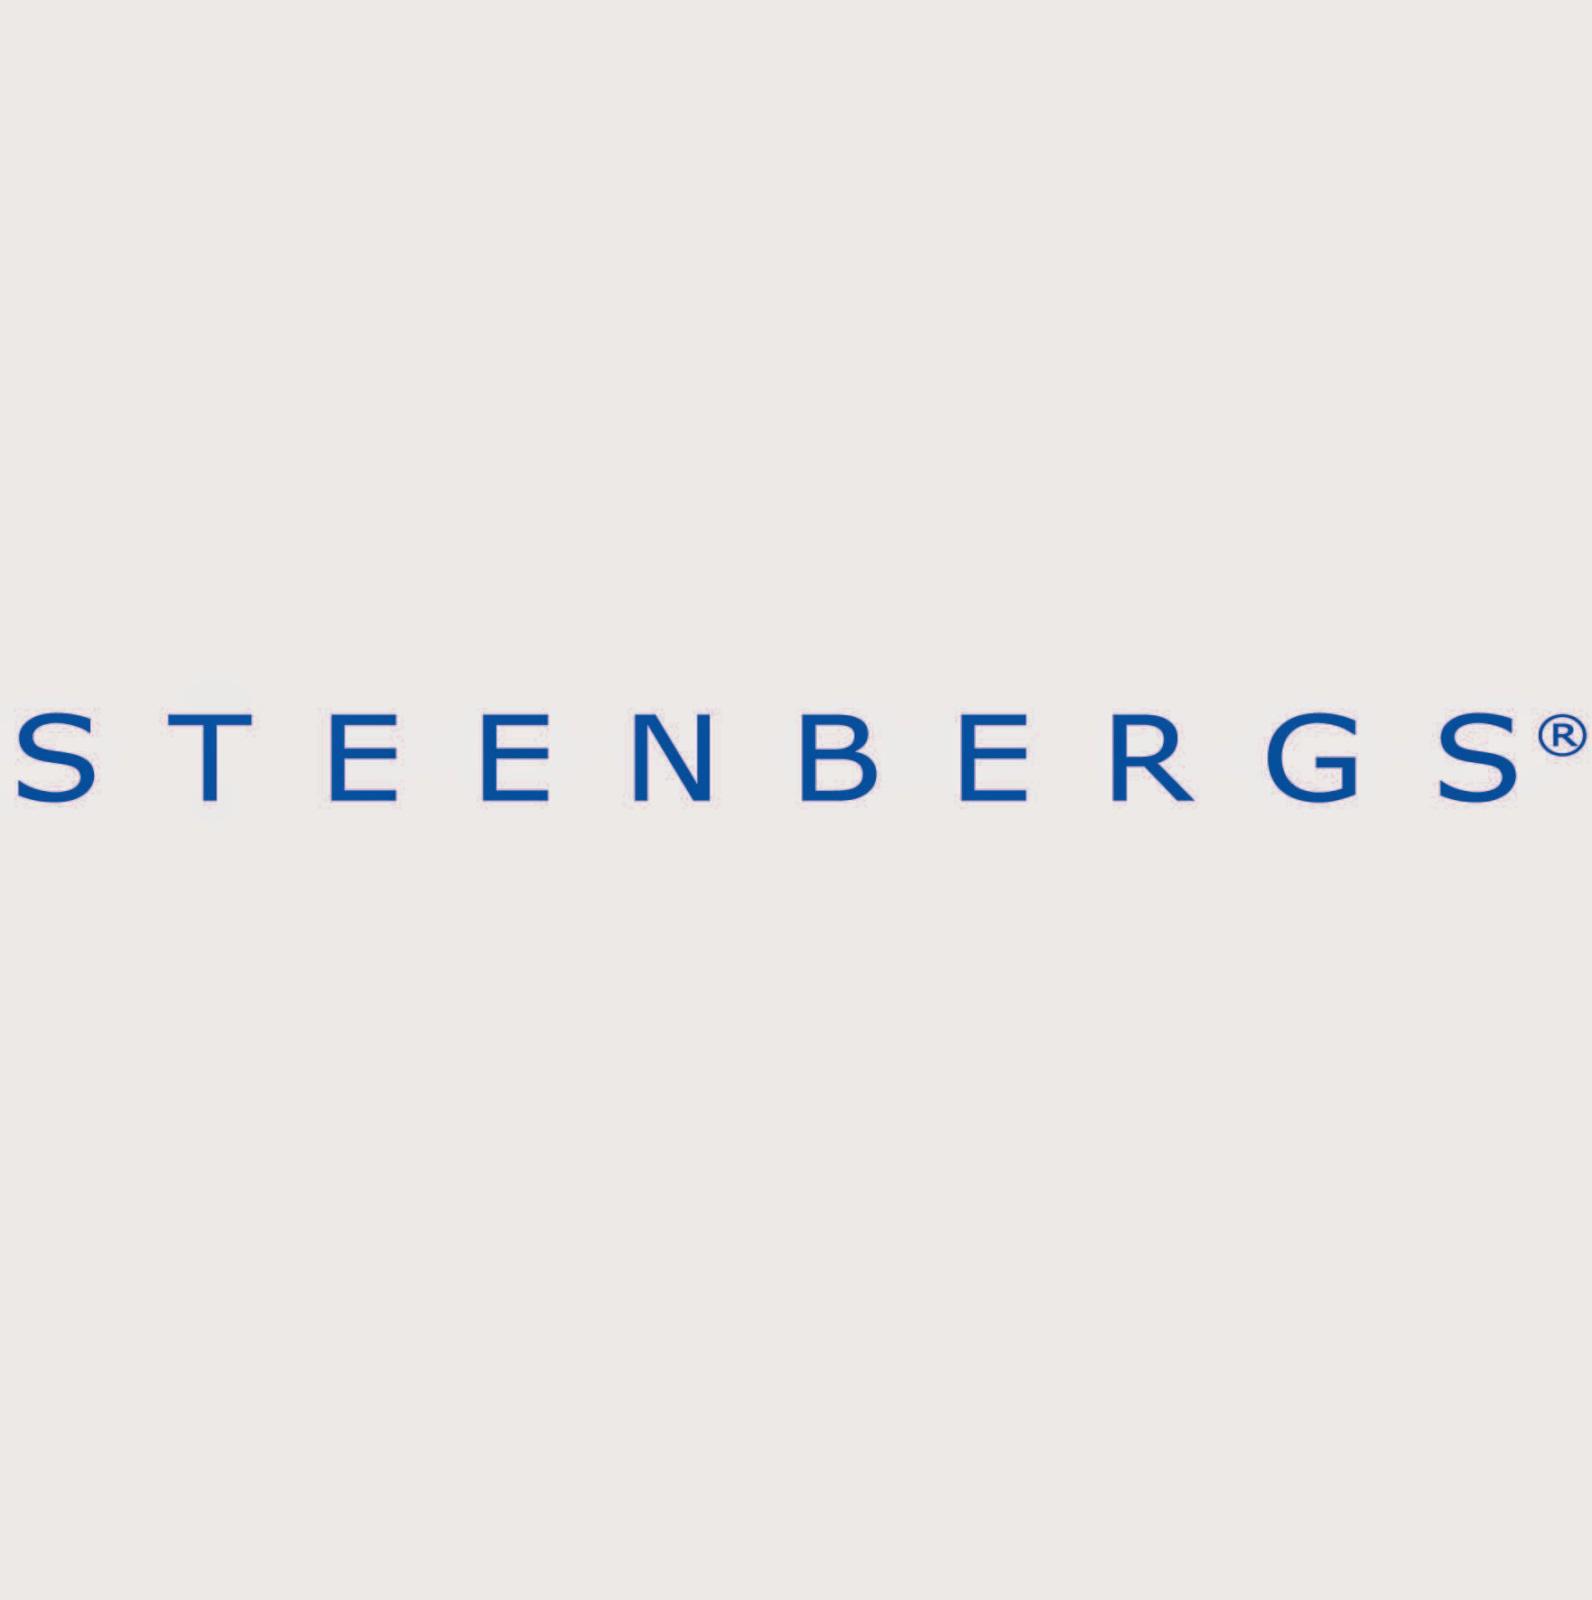 Steenbergs